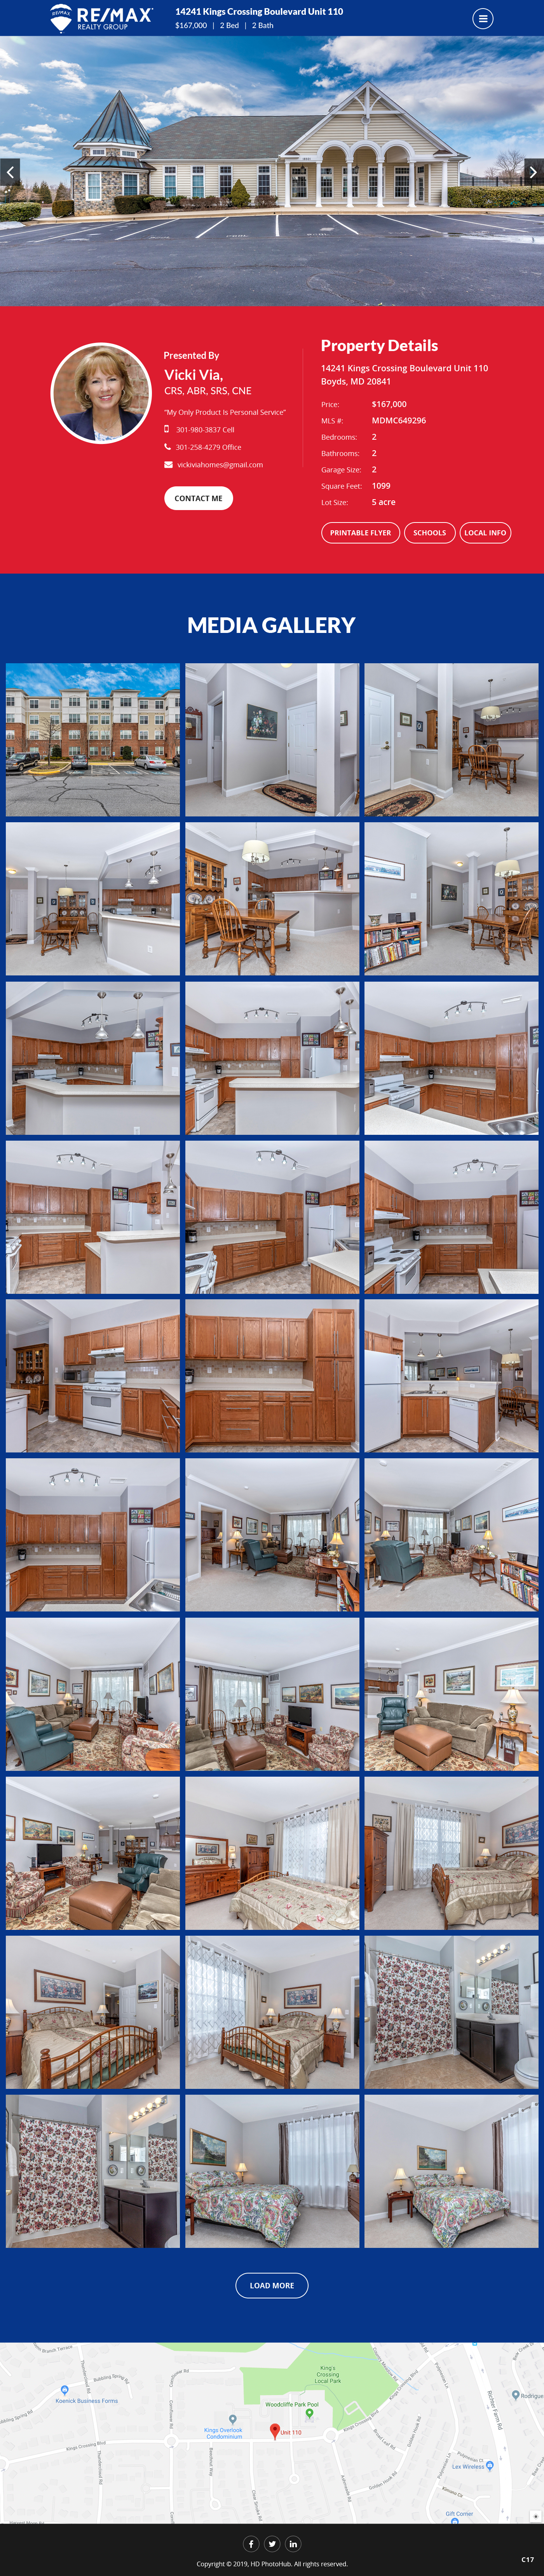 Participating Entry #13 for Website Design contest - Single Real Estate Property Listing Website Template - original